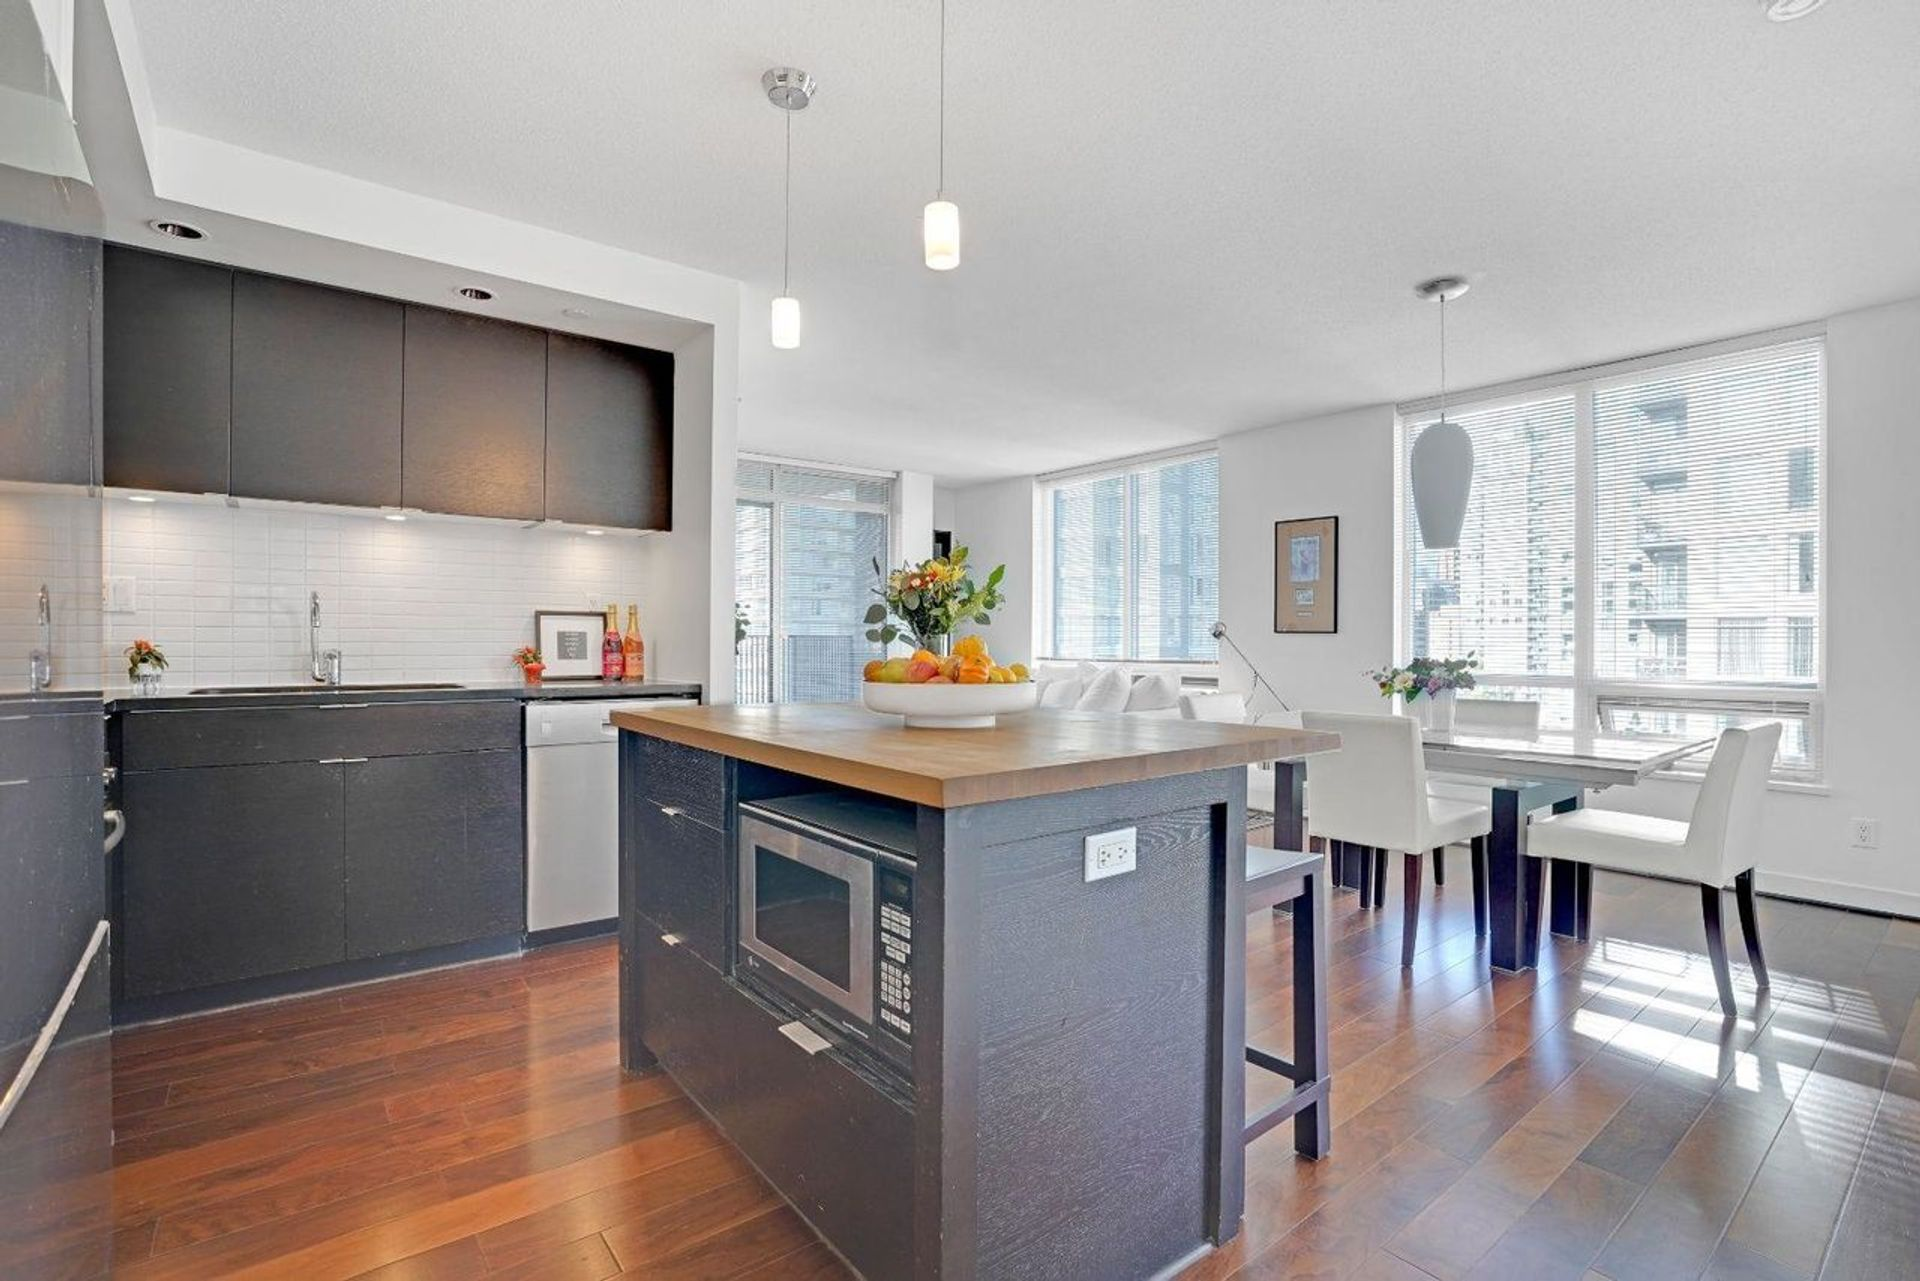 1055-homer-street-yaletown-vancouver-west-04 at 1705 - 1055 Homer Street, Yaletown, Vancouver West